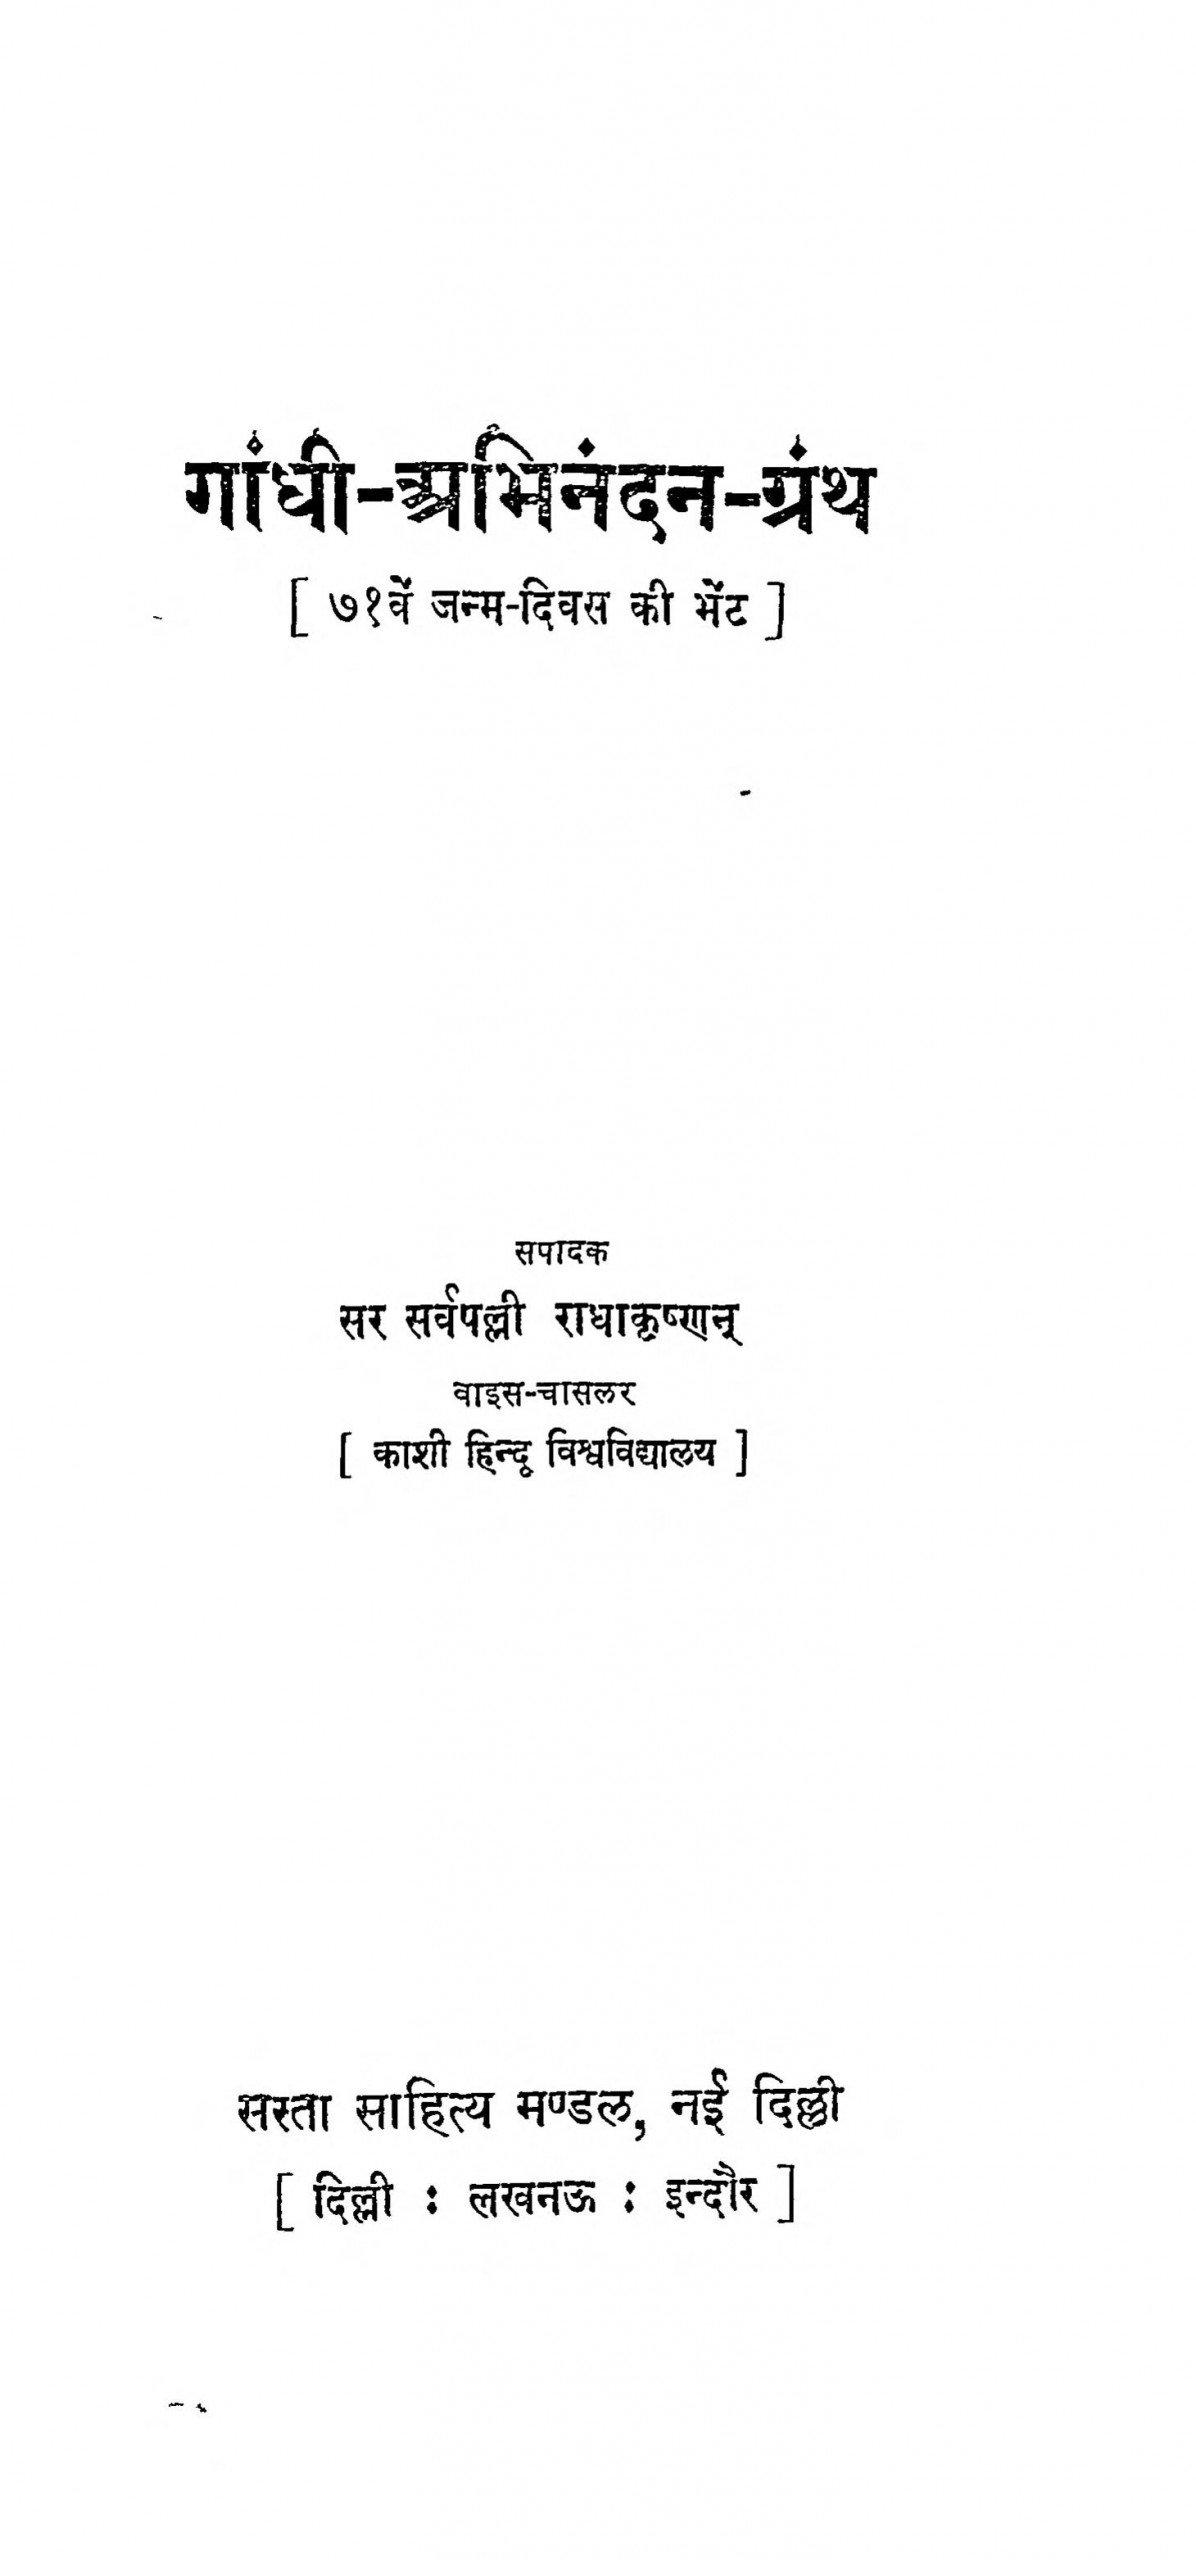 Book Image : गांधी अभिमंदन ग्रन्थ - Gandhi Abhinandan-granth